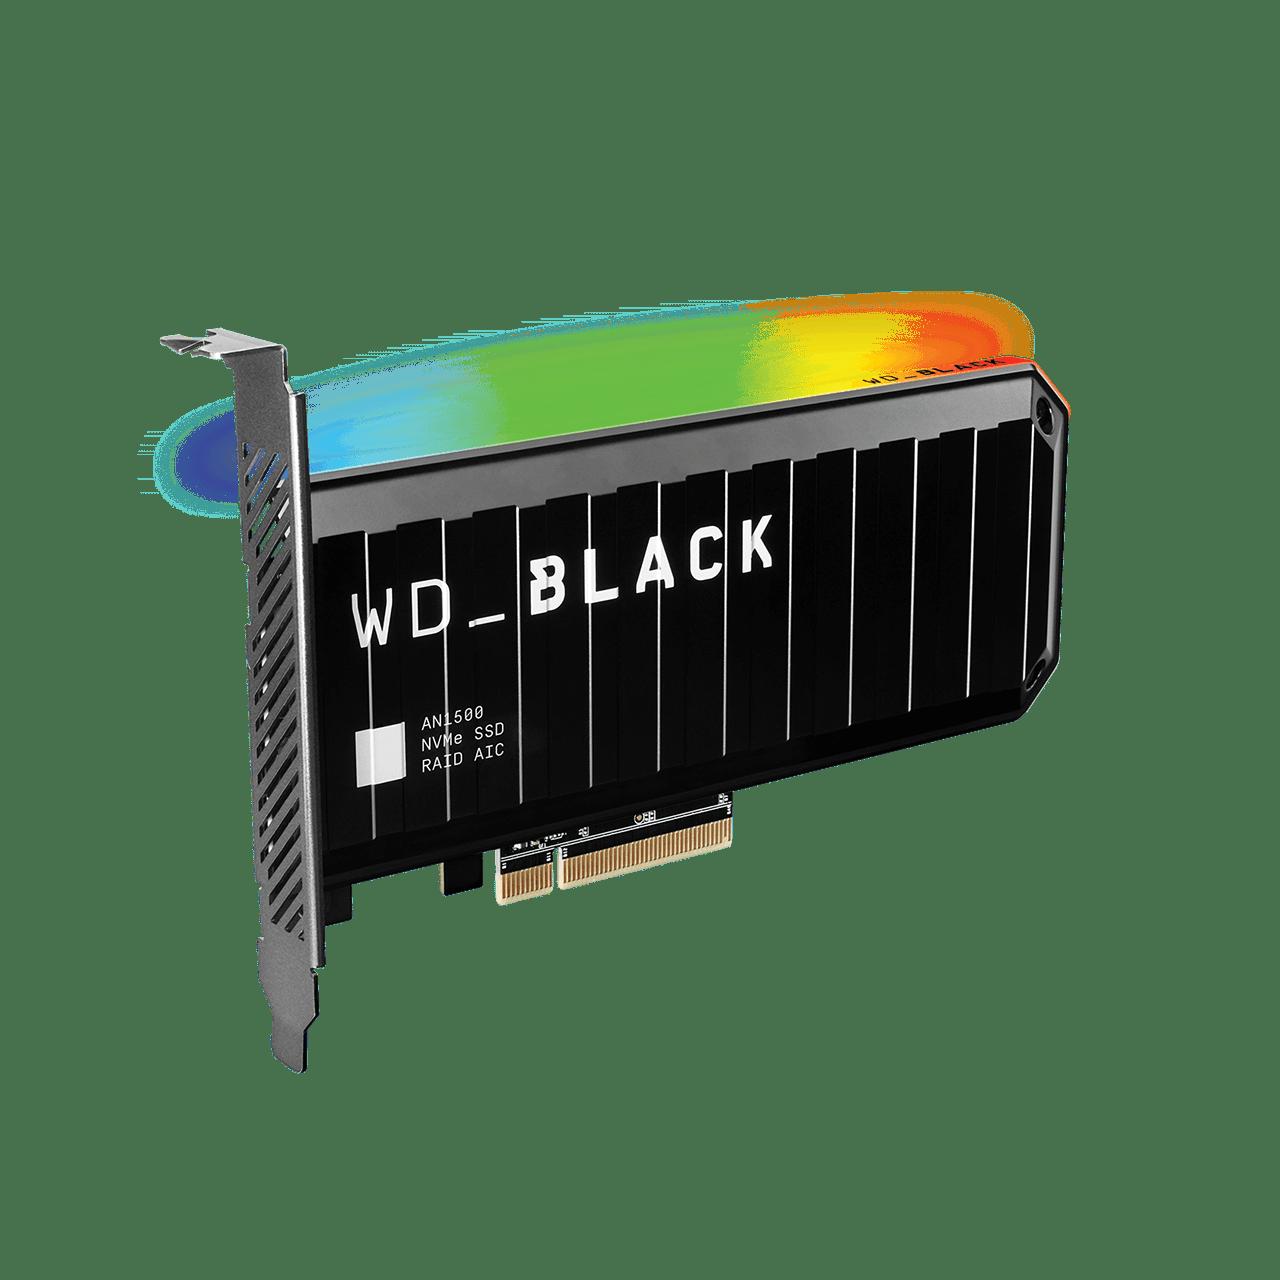 WD BLACK AN1500: un SSD in formato scheda PCIe